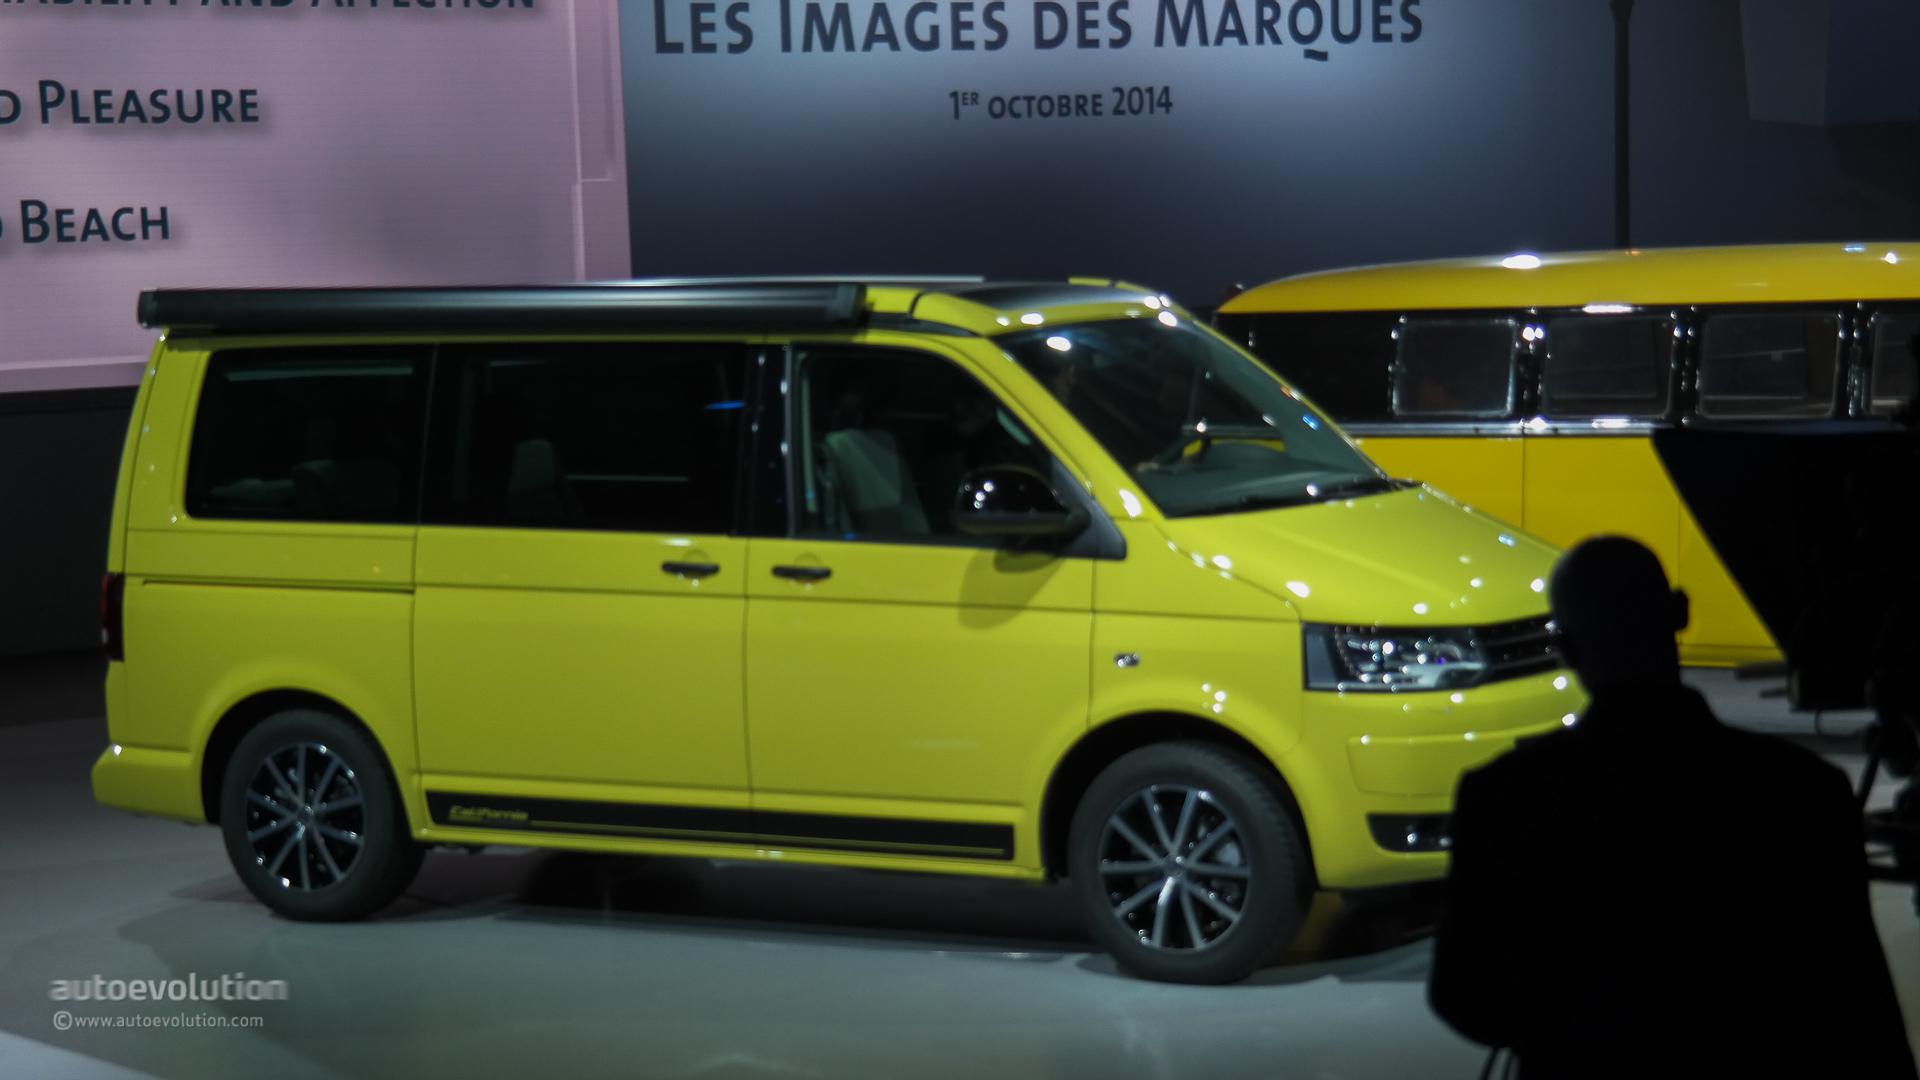 volkswagen tristar signals the vw t6 van is coming live photos autoevolution. Black Bedroom Furniture Sets. Home Design Ideas